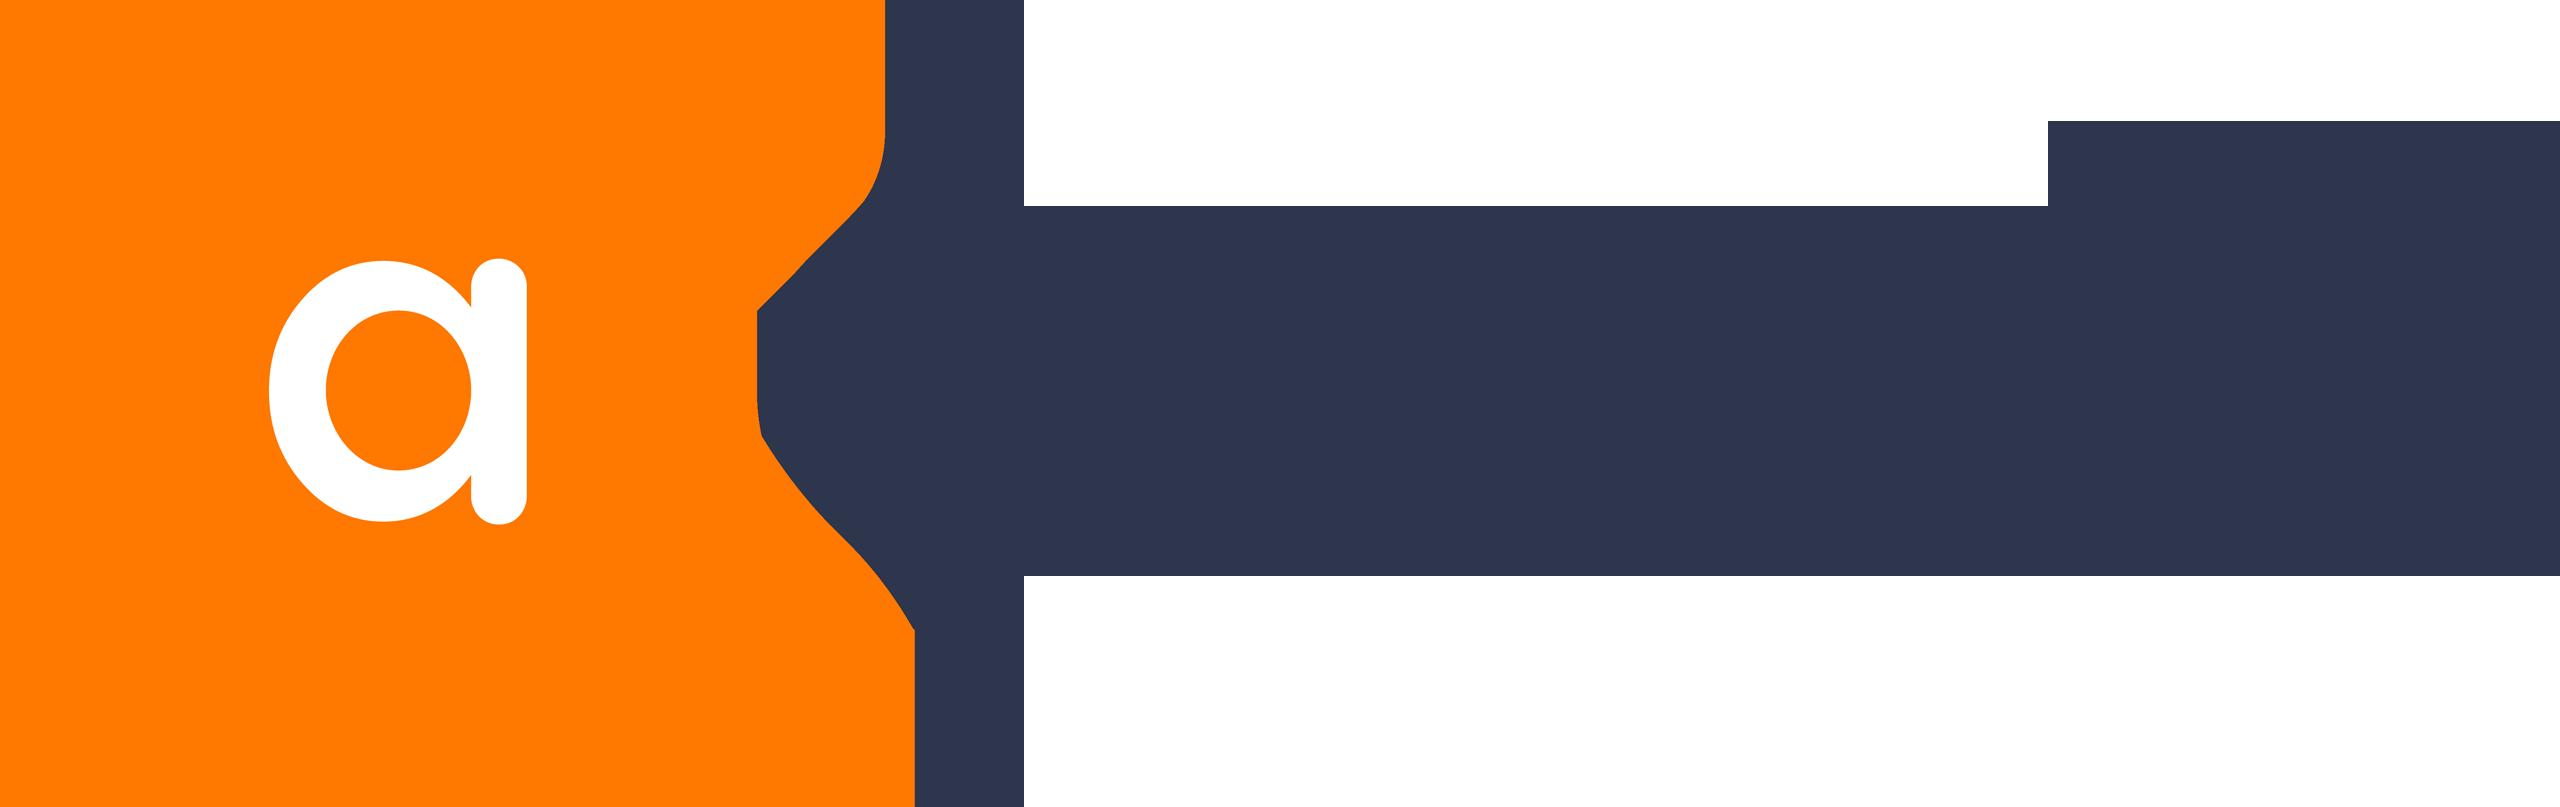 AVAST Smart Life Platform